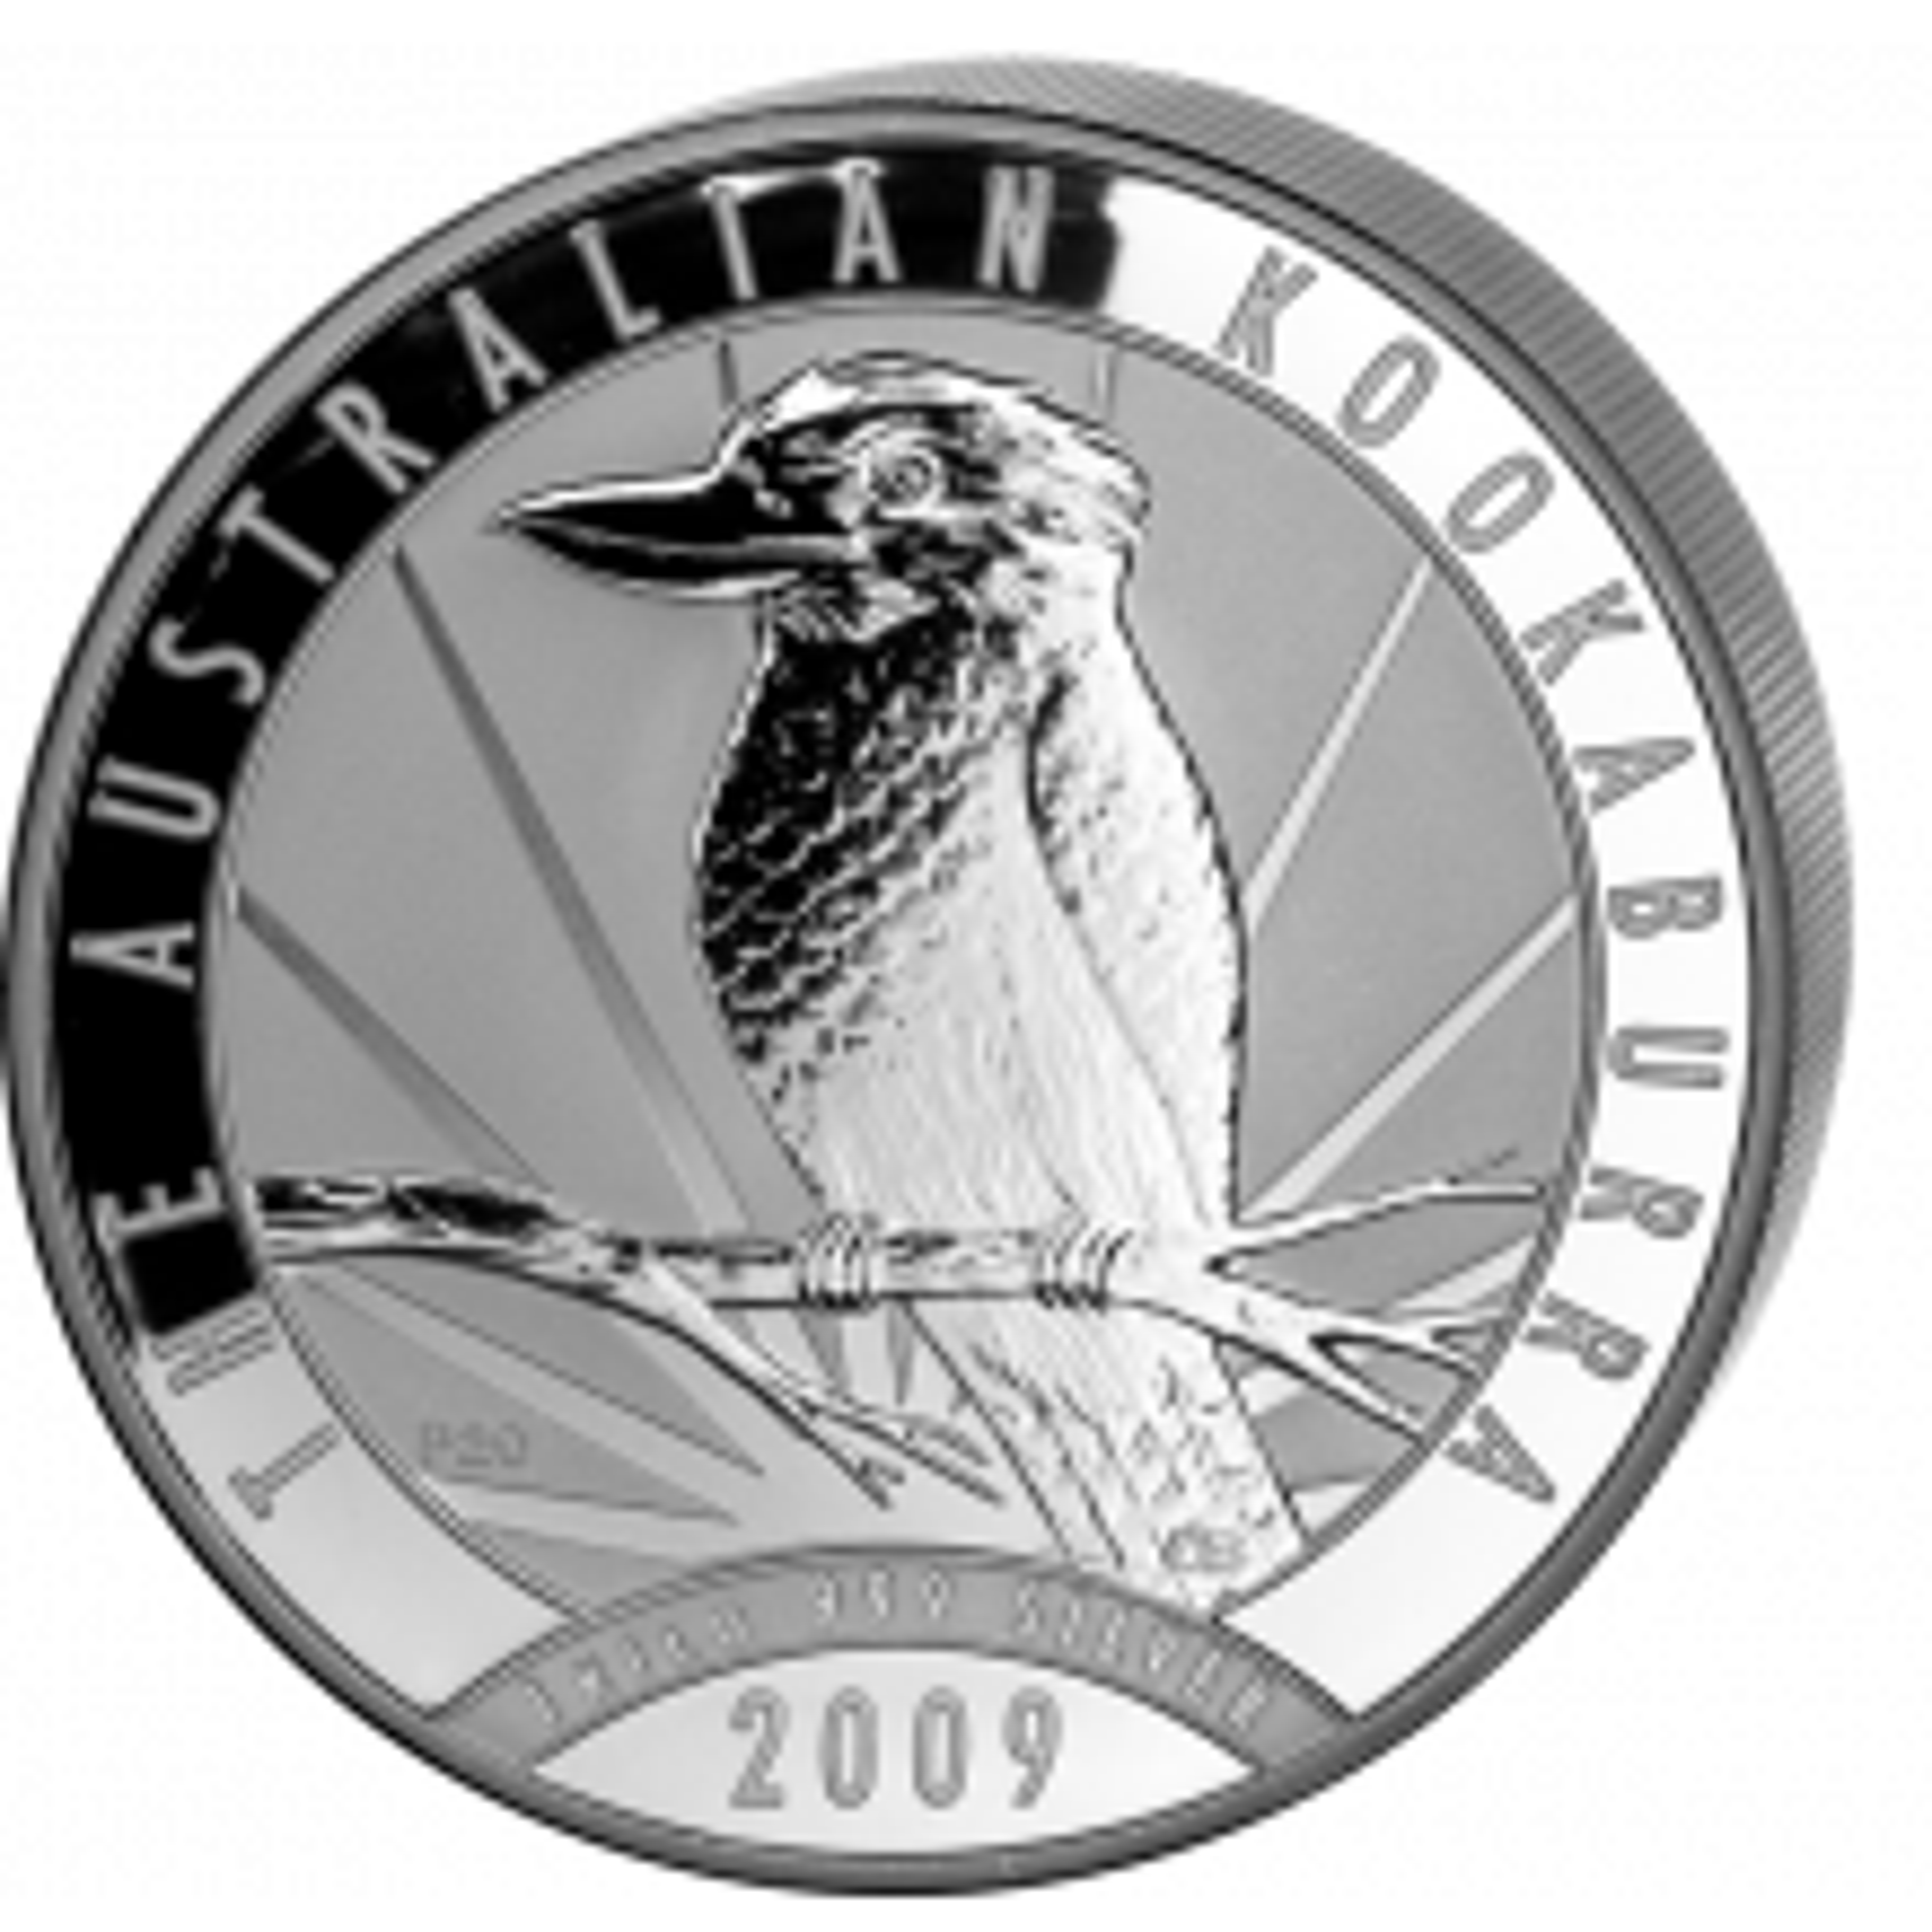 1 Kilo Kookaburra silver coin 2009